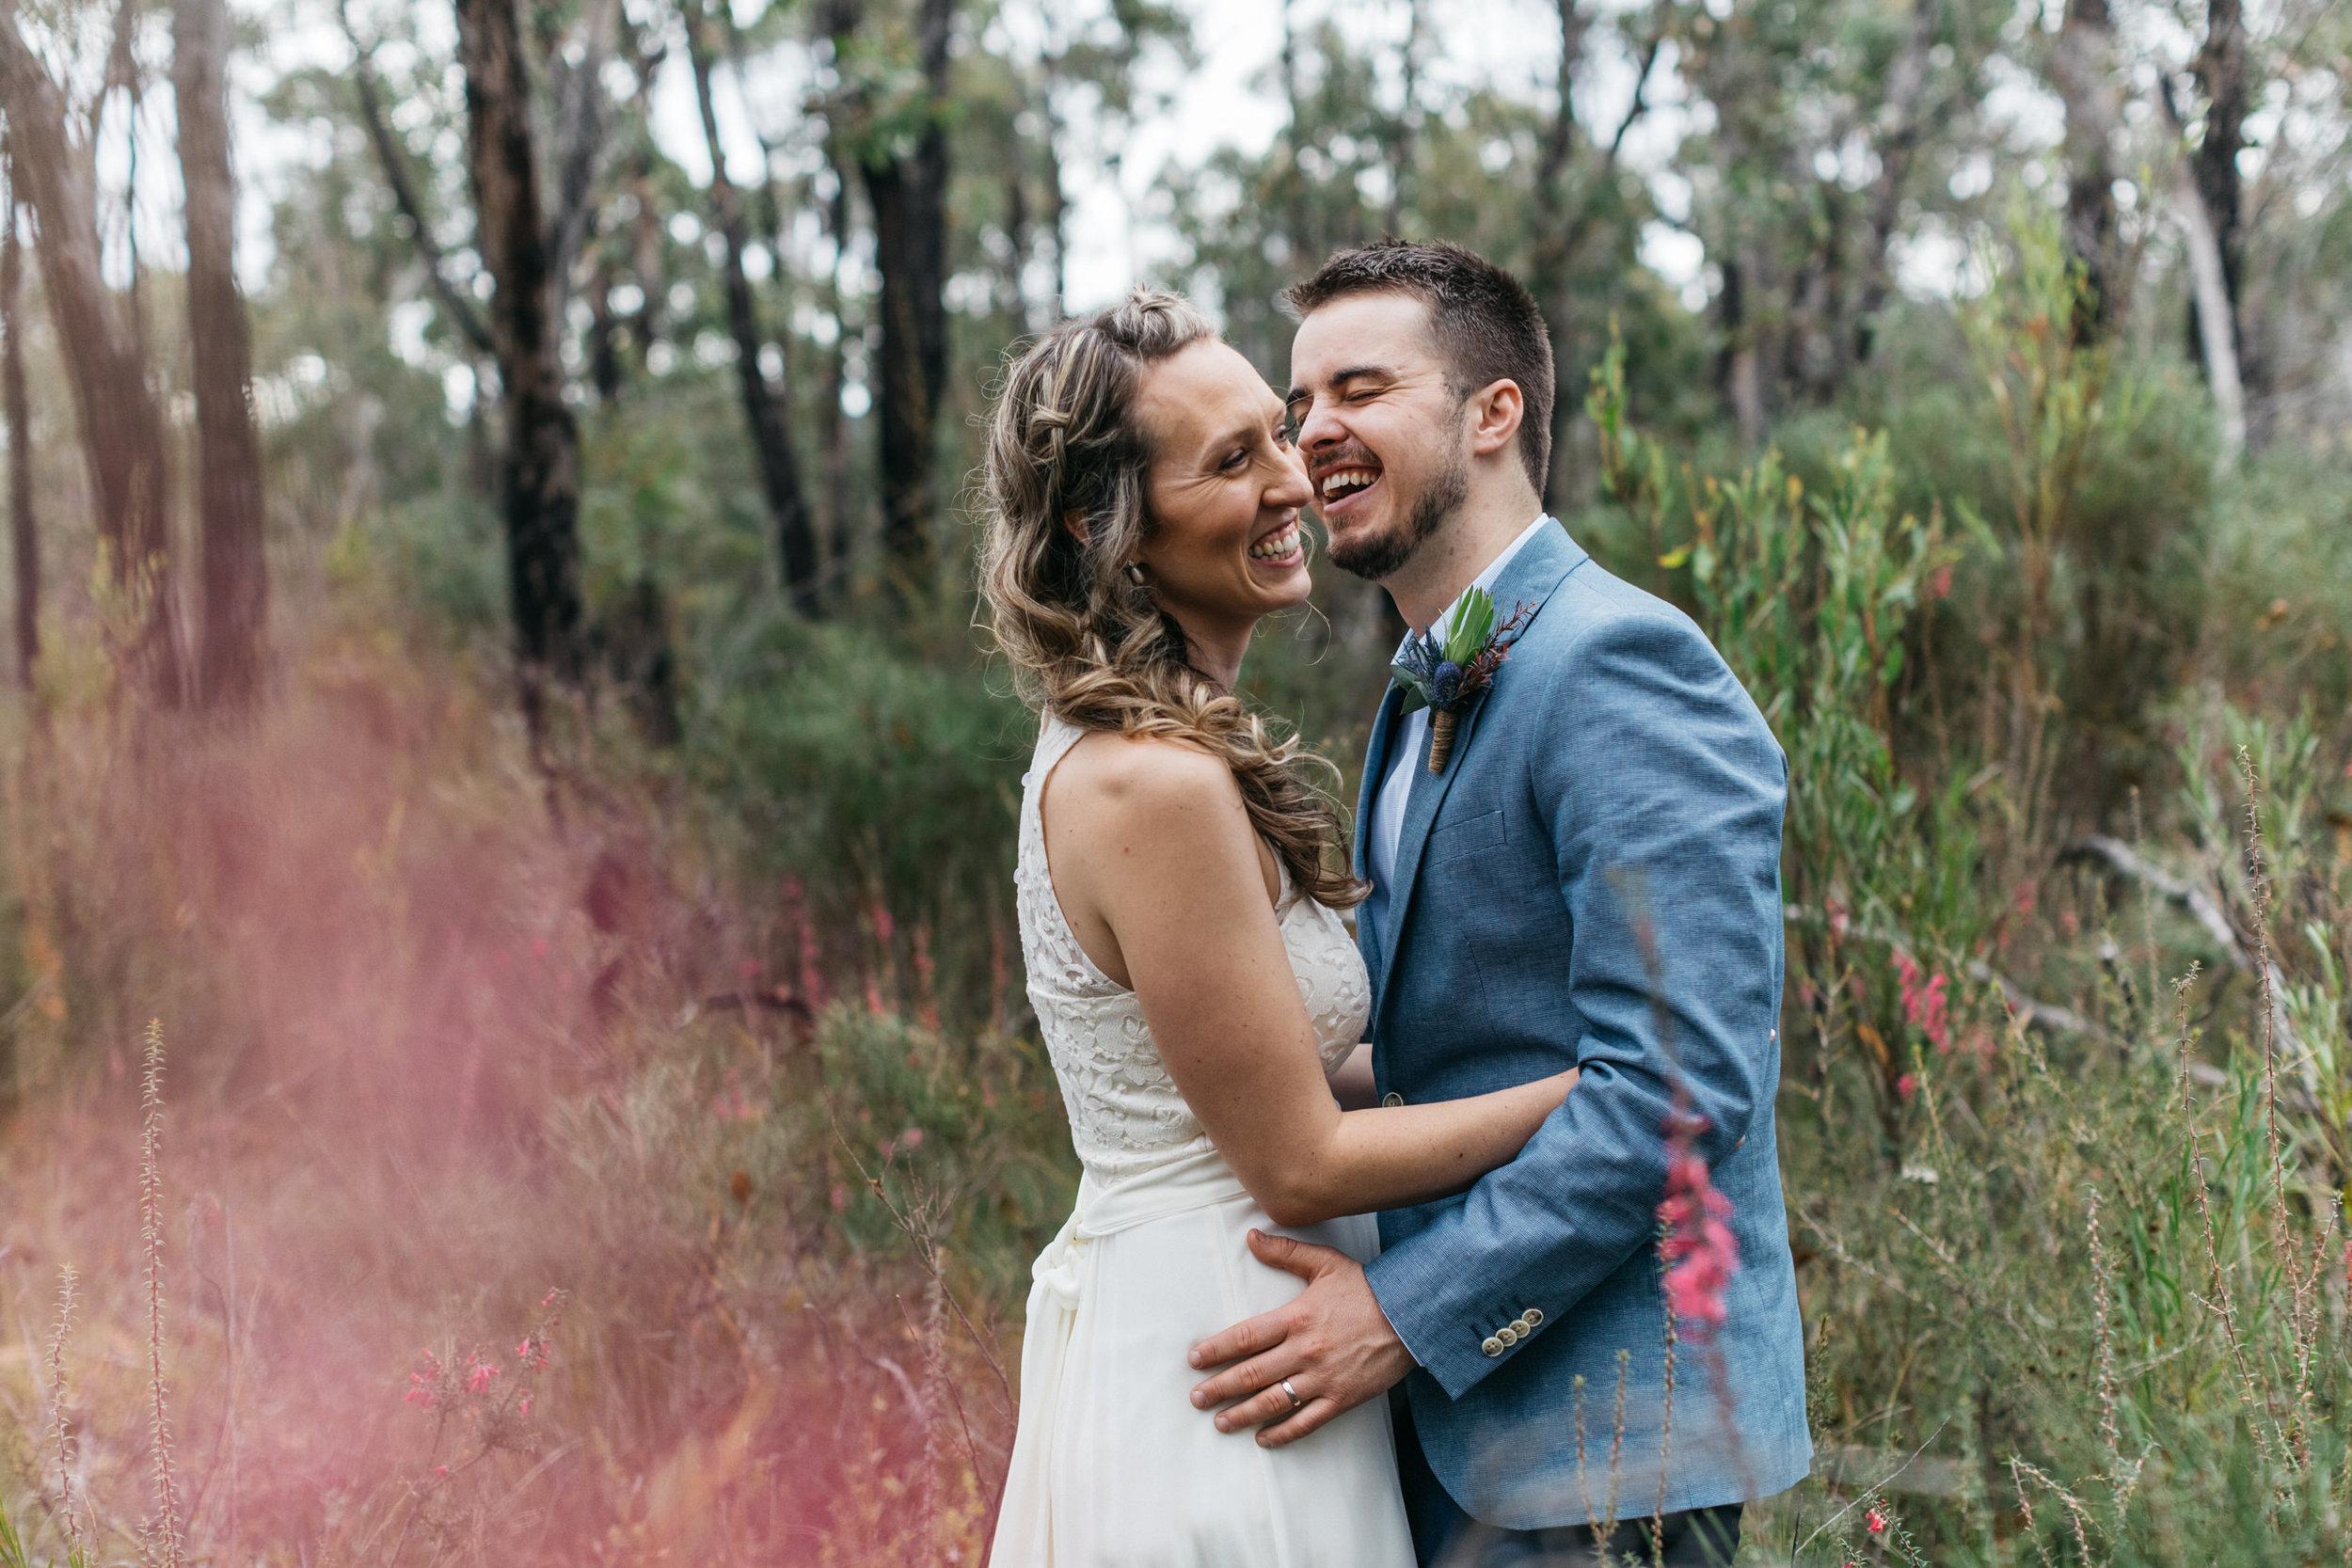 Mylor Farm Elopement South Australia 040.jpg